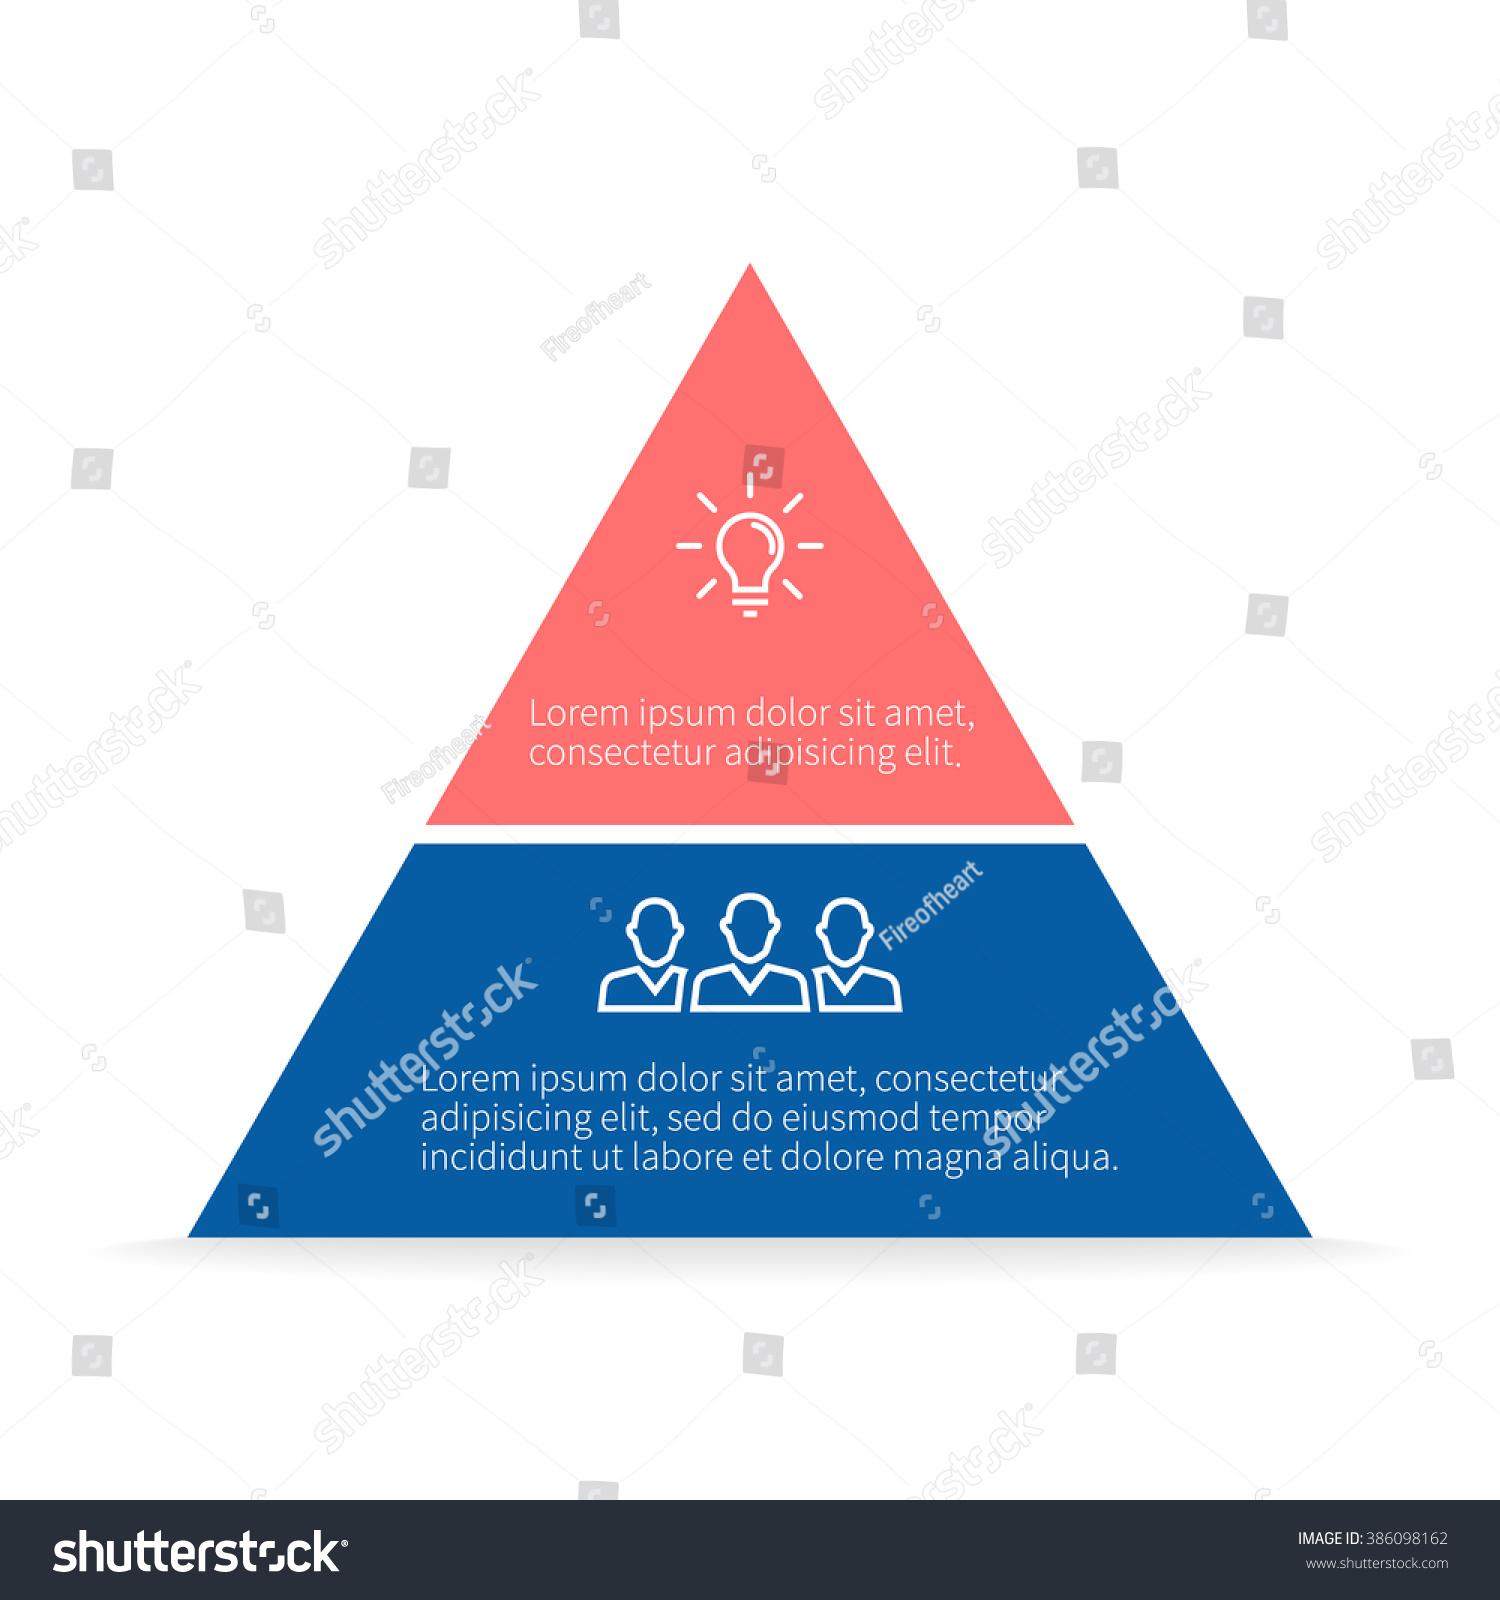 Pyramiding stock options